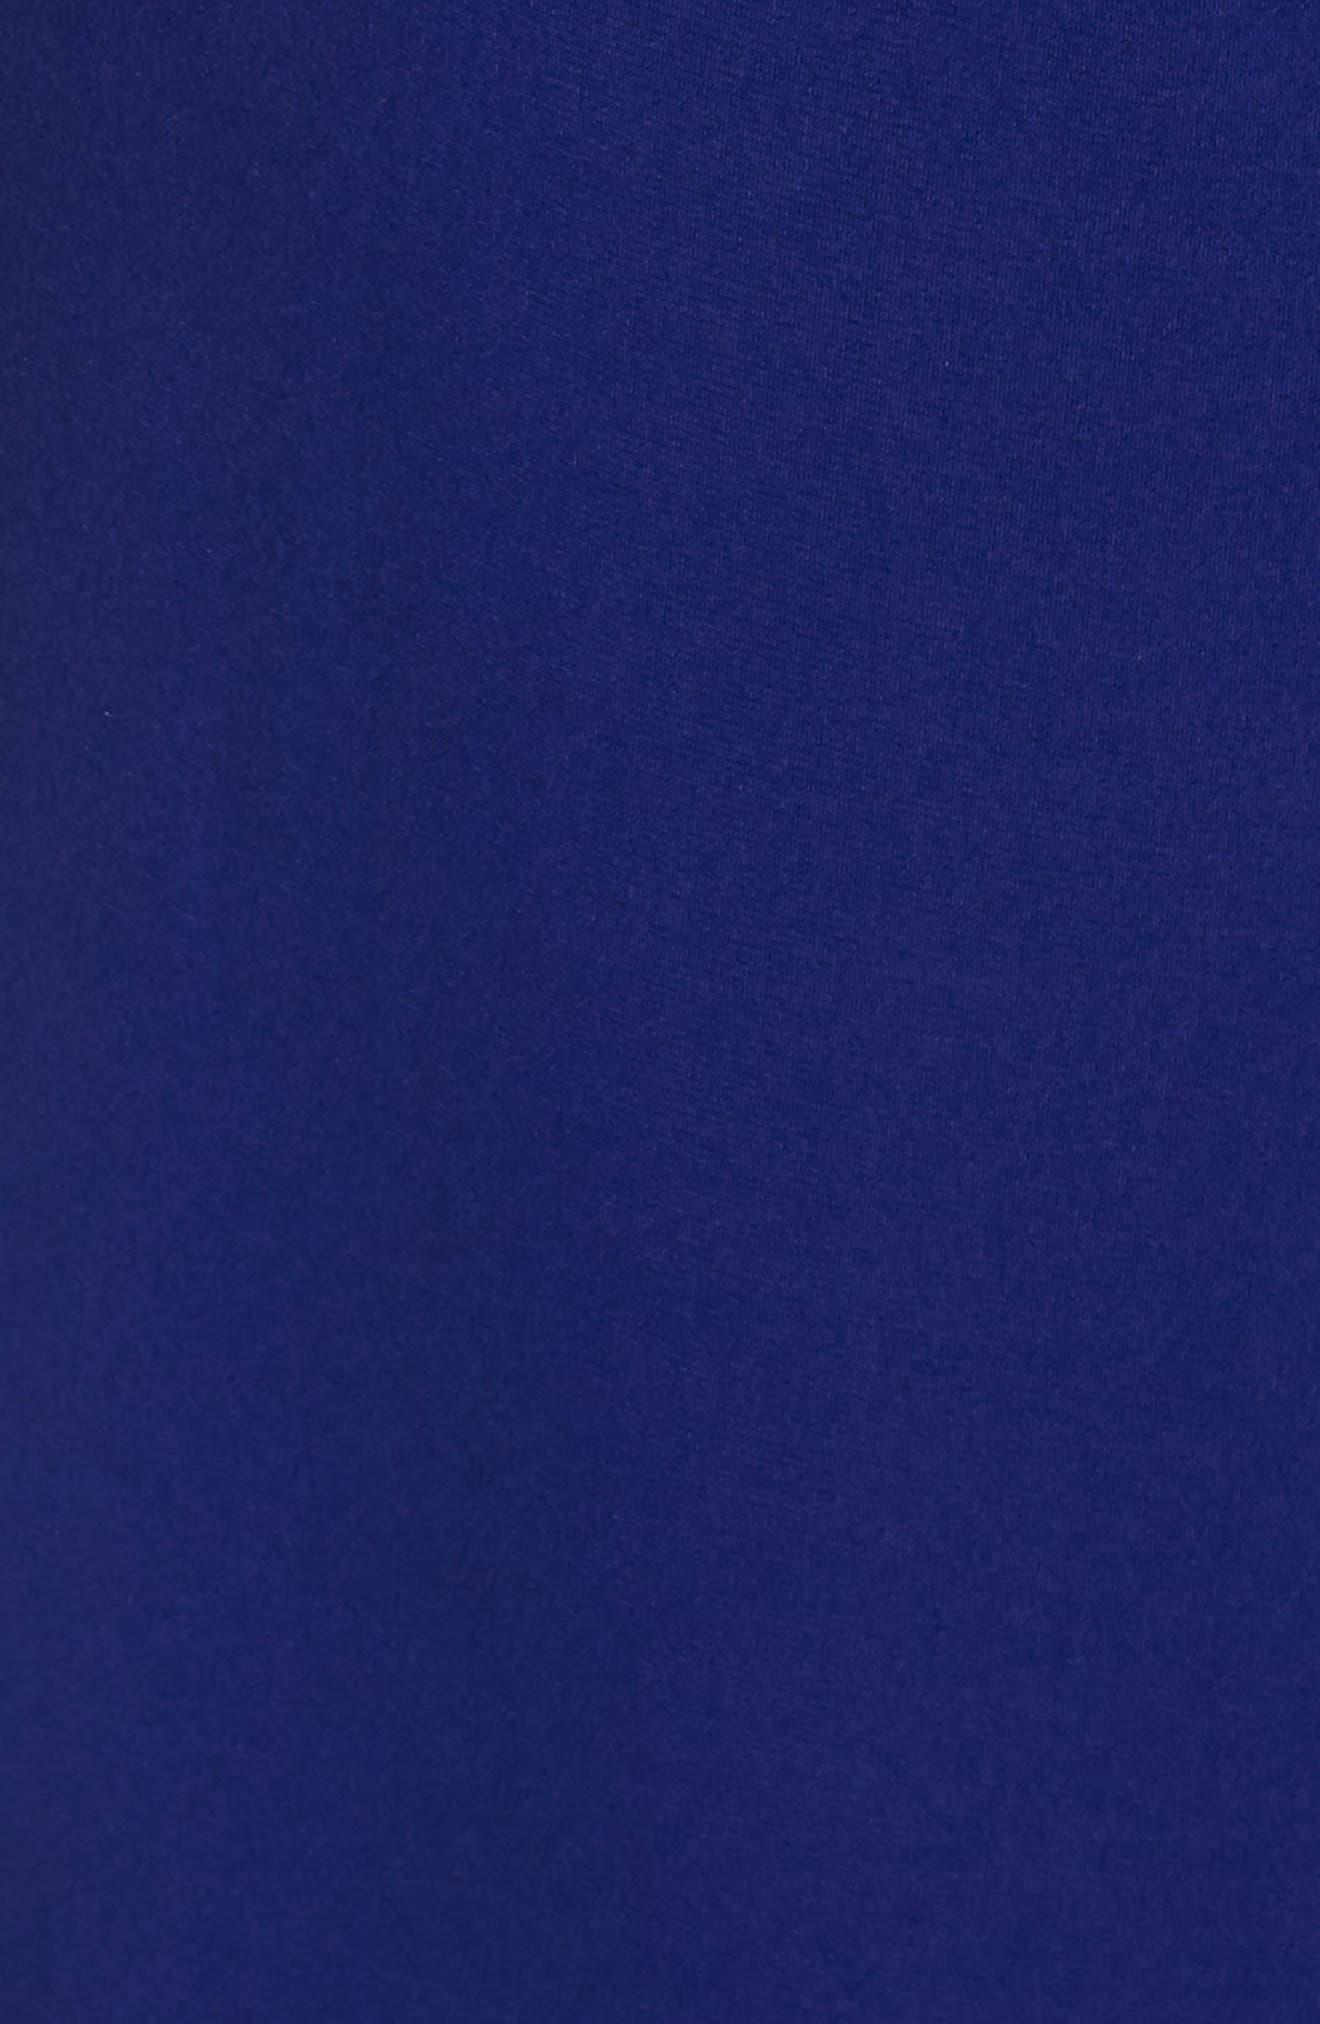 VINCE CAMUTO, High Halter Neck Jumpsuit, Alternate thumbnail 6, color, COBALT